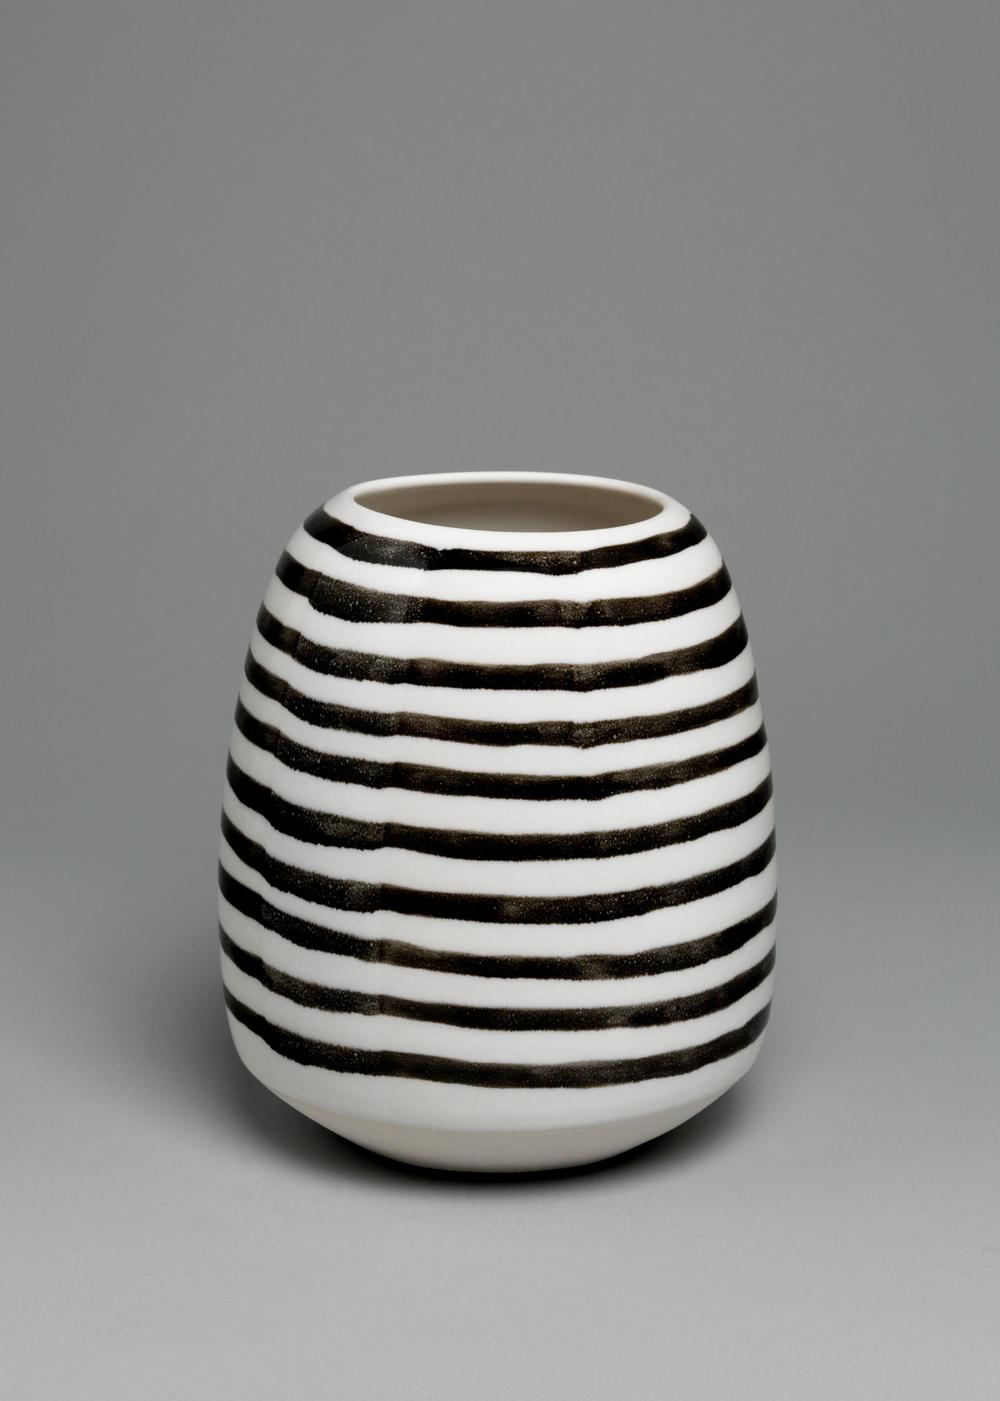 Shio Kusaka  Untitled (stripe 32)  2011 Porcelain 7 3/8h x 6w x 6d in SK278